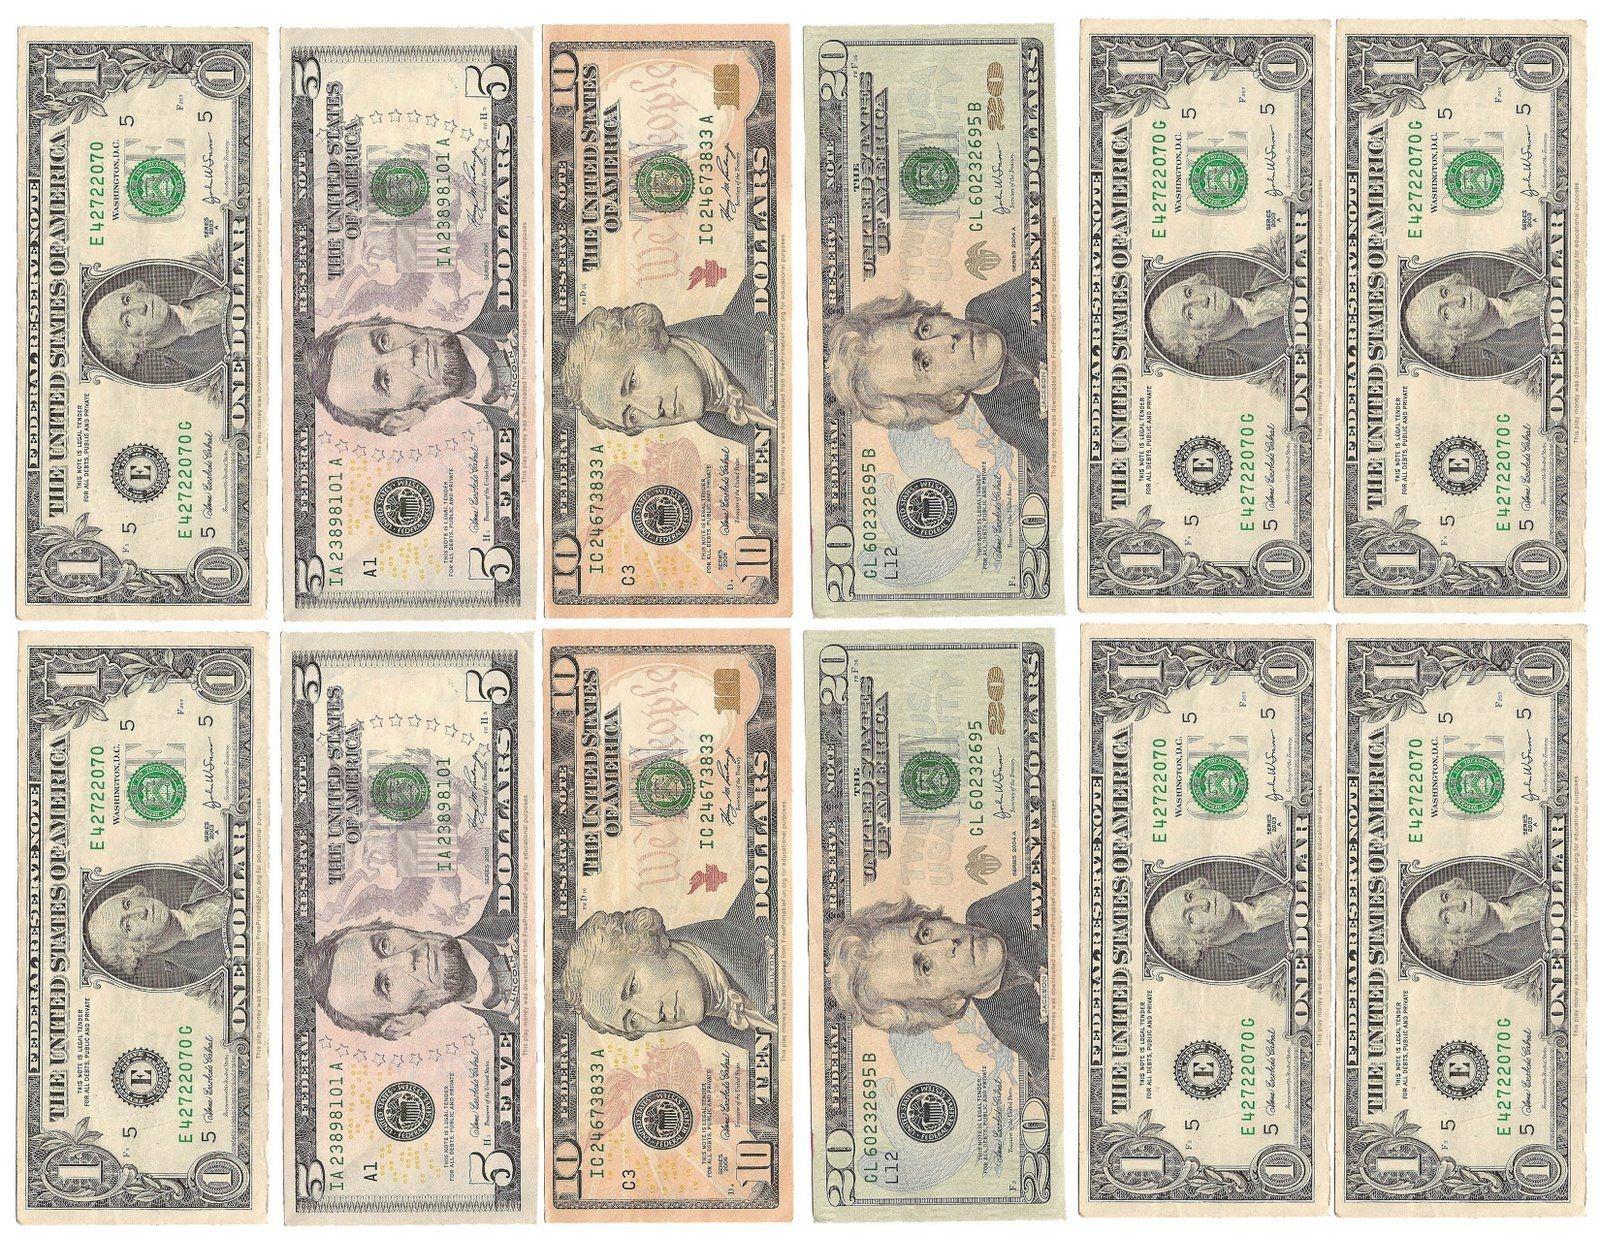 Money Money Money!   Kid's Room   Play Money Template, Printable - Free Printable Fake Money That Looks Real